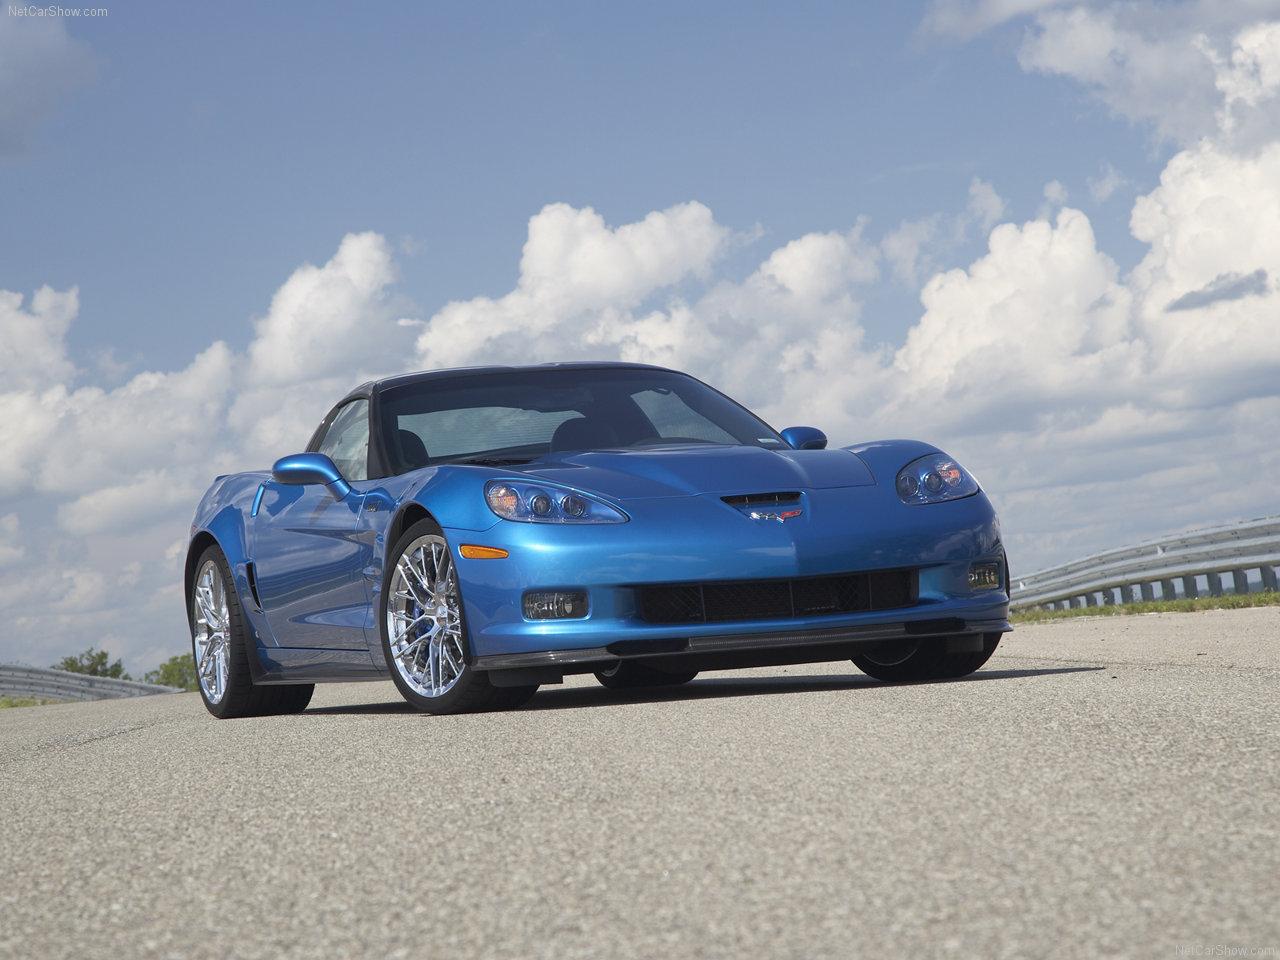 http://2.bp.blogspot.com/_Uo4WUJnySi8/S9cMSDMA0mI/AAAAAAAAAG4/EA-KOm021Uo/s1600/Chevrolet-Corvette_ZR1_2009_1280x960_wallpaper_01.jpg